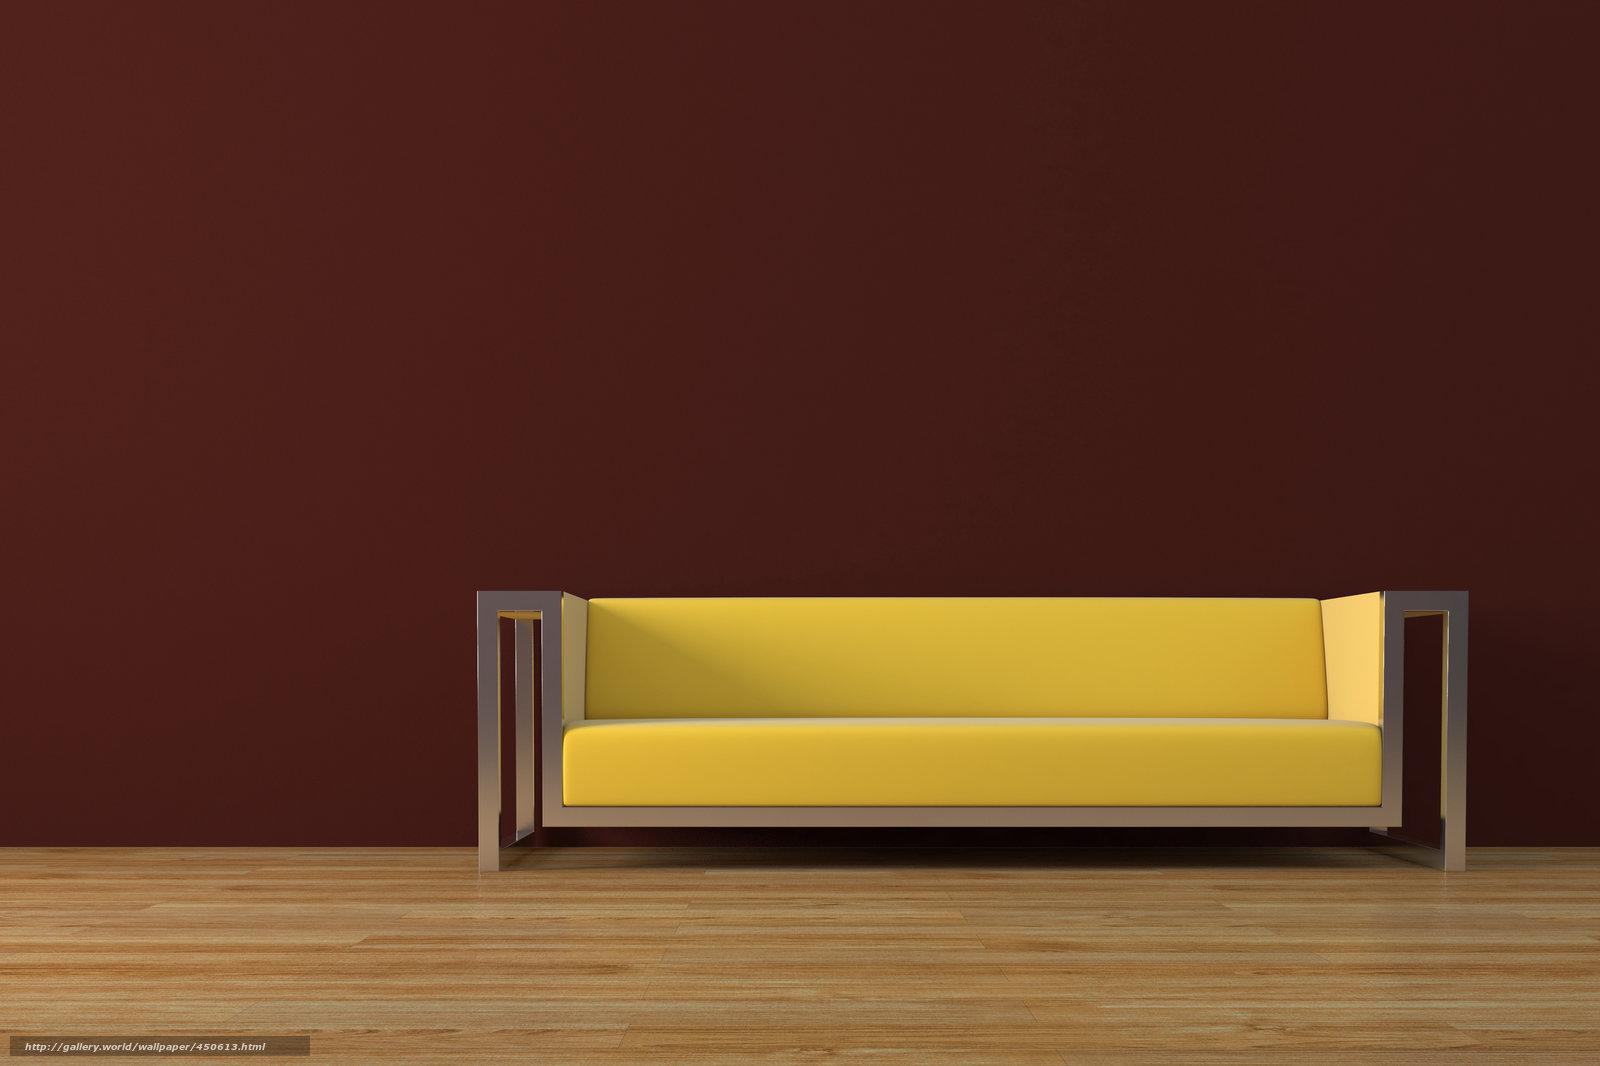 furniture computer wallpapers desktop - photo #18